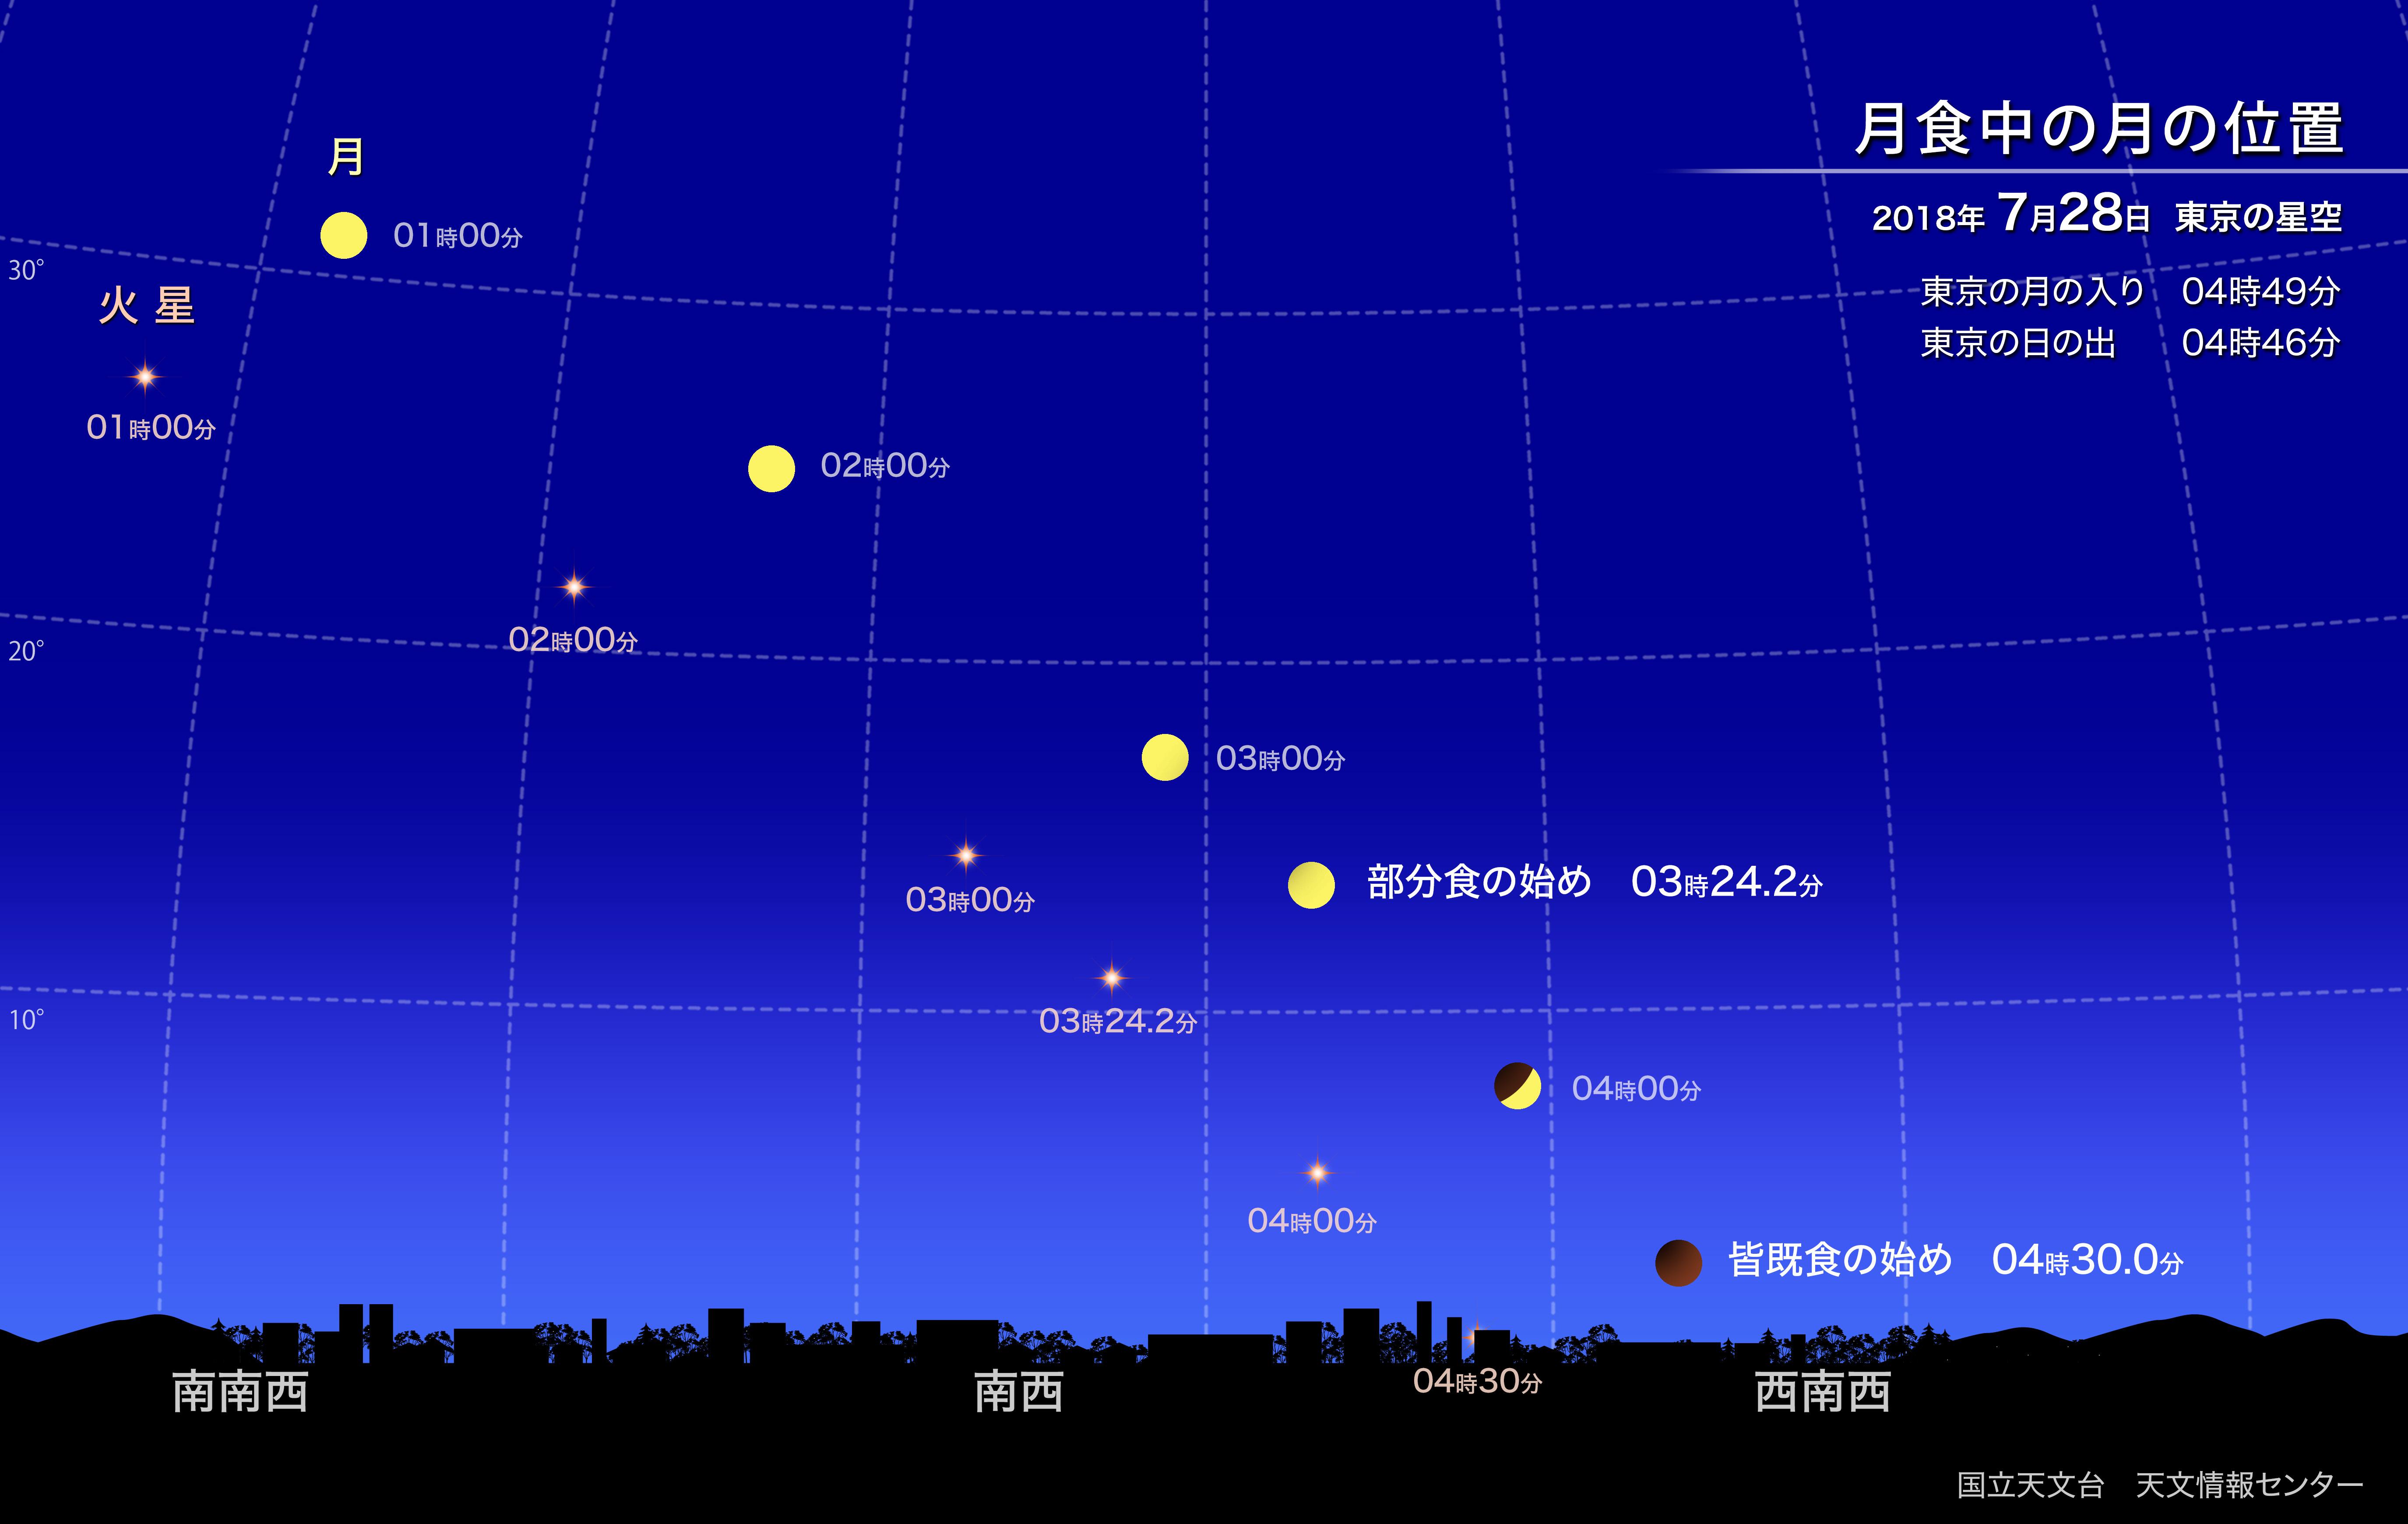 https://www.nao.ac.jp/contents/astro/sky/2018/07/topics02-3-l.jpg?=20180723